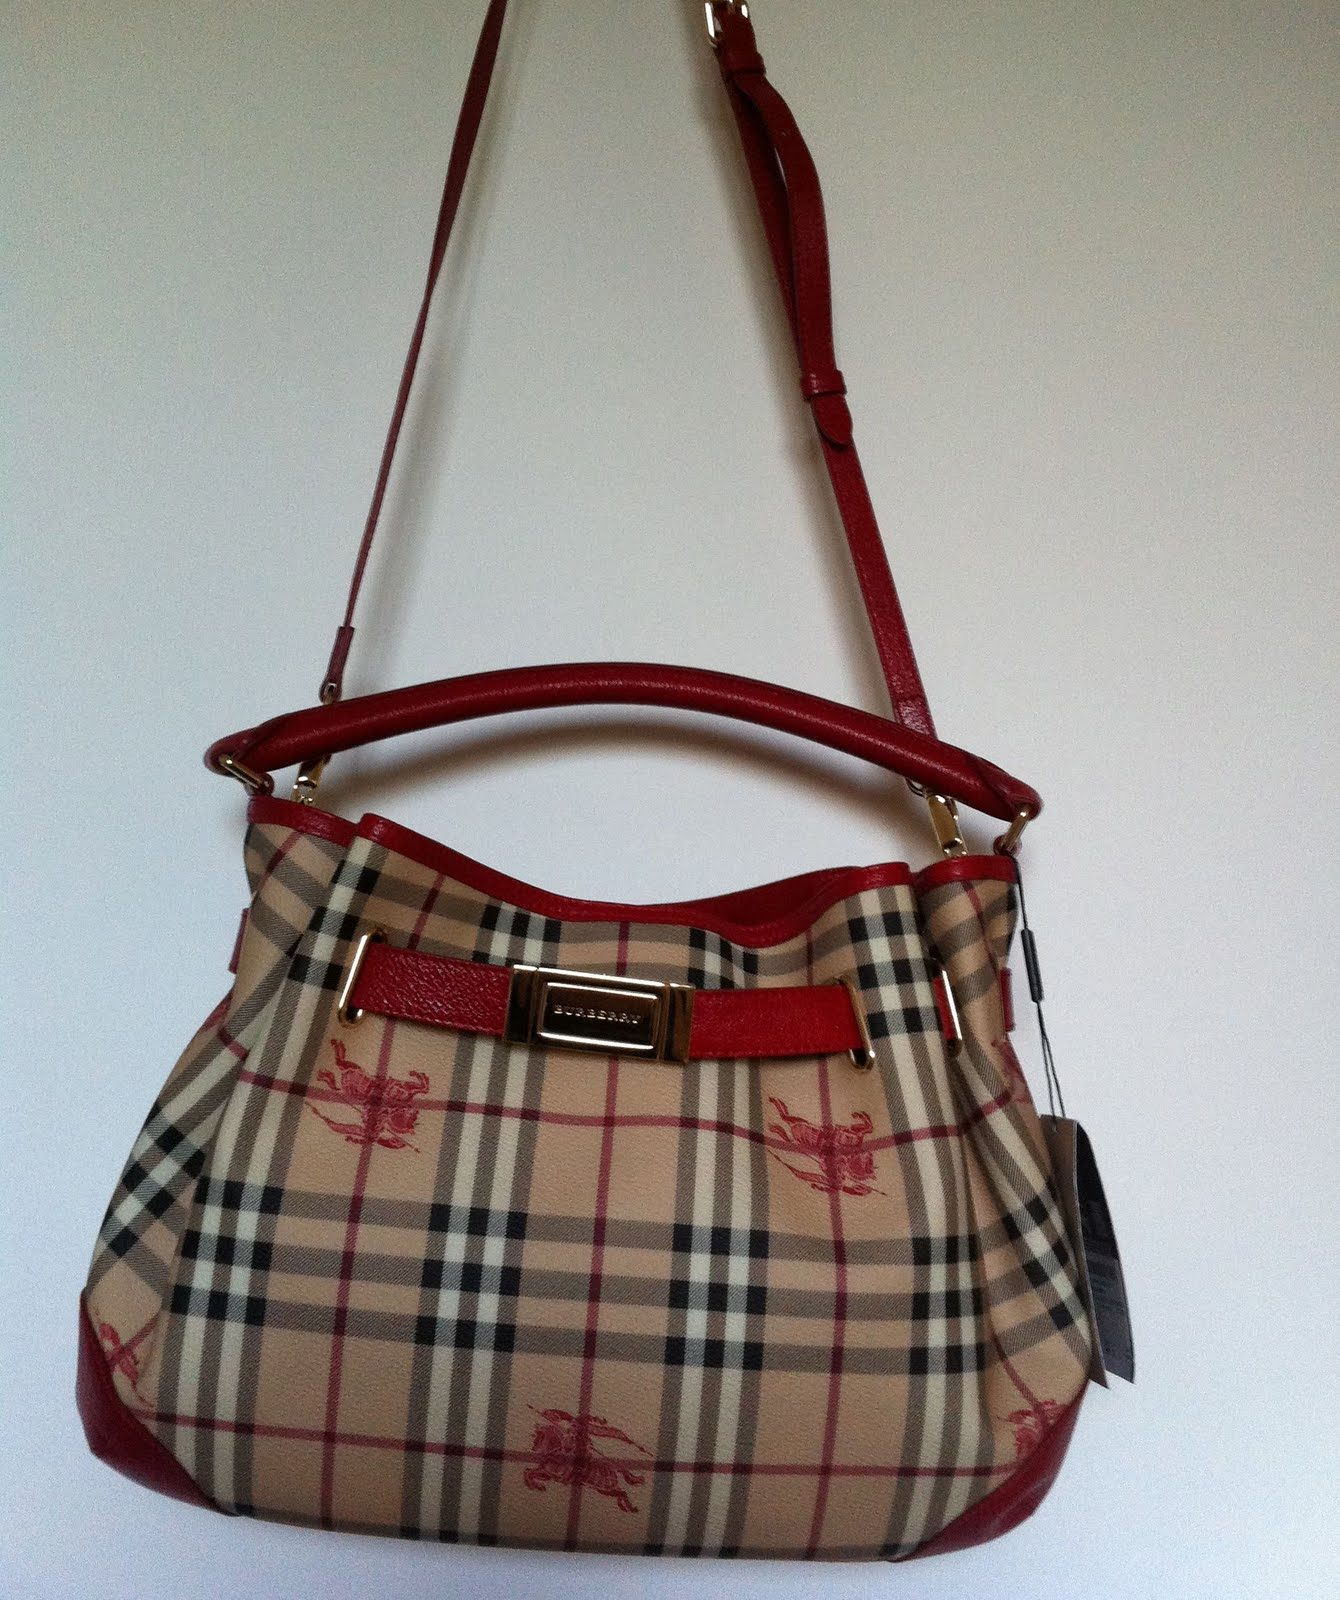 Discounted Genuine Handbags: (New) Authentic Burberry Hobo ...